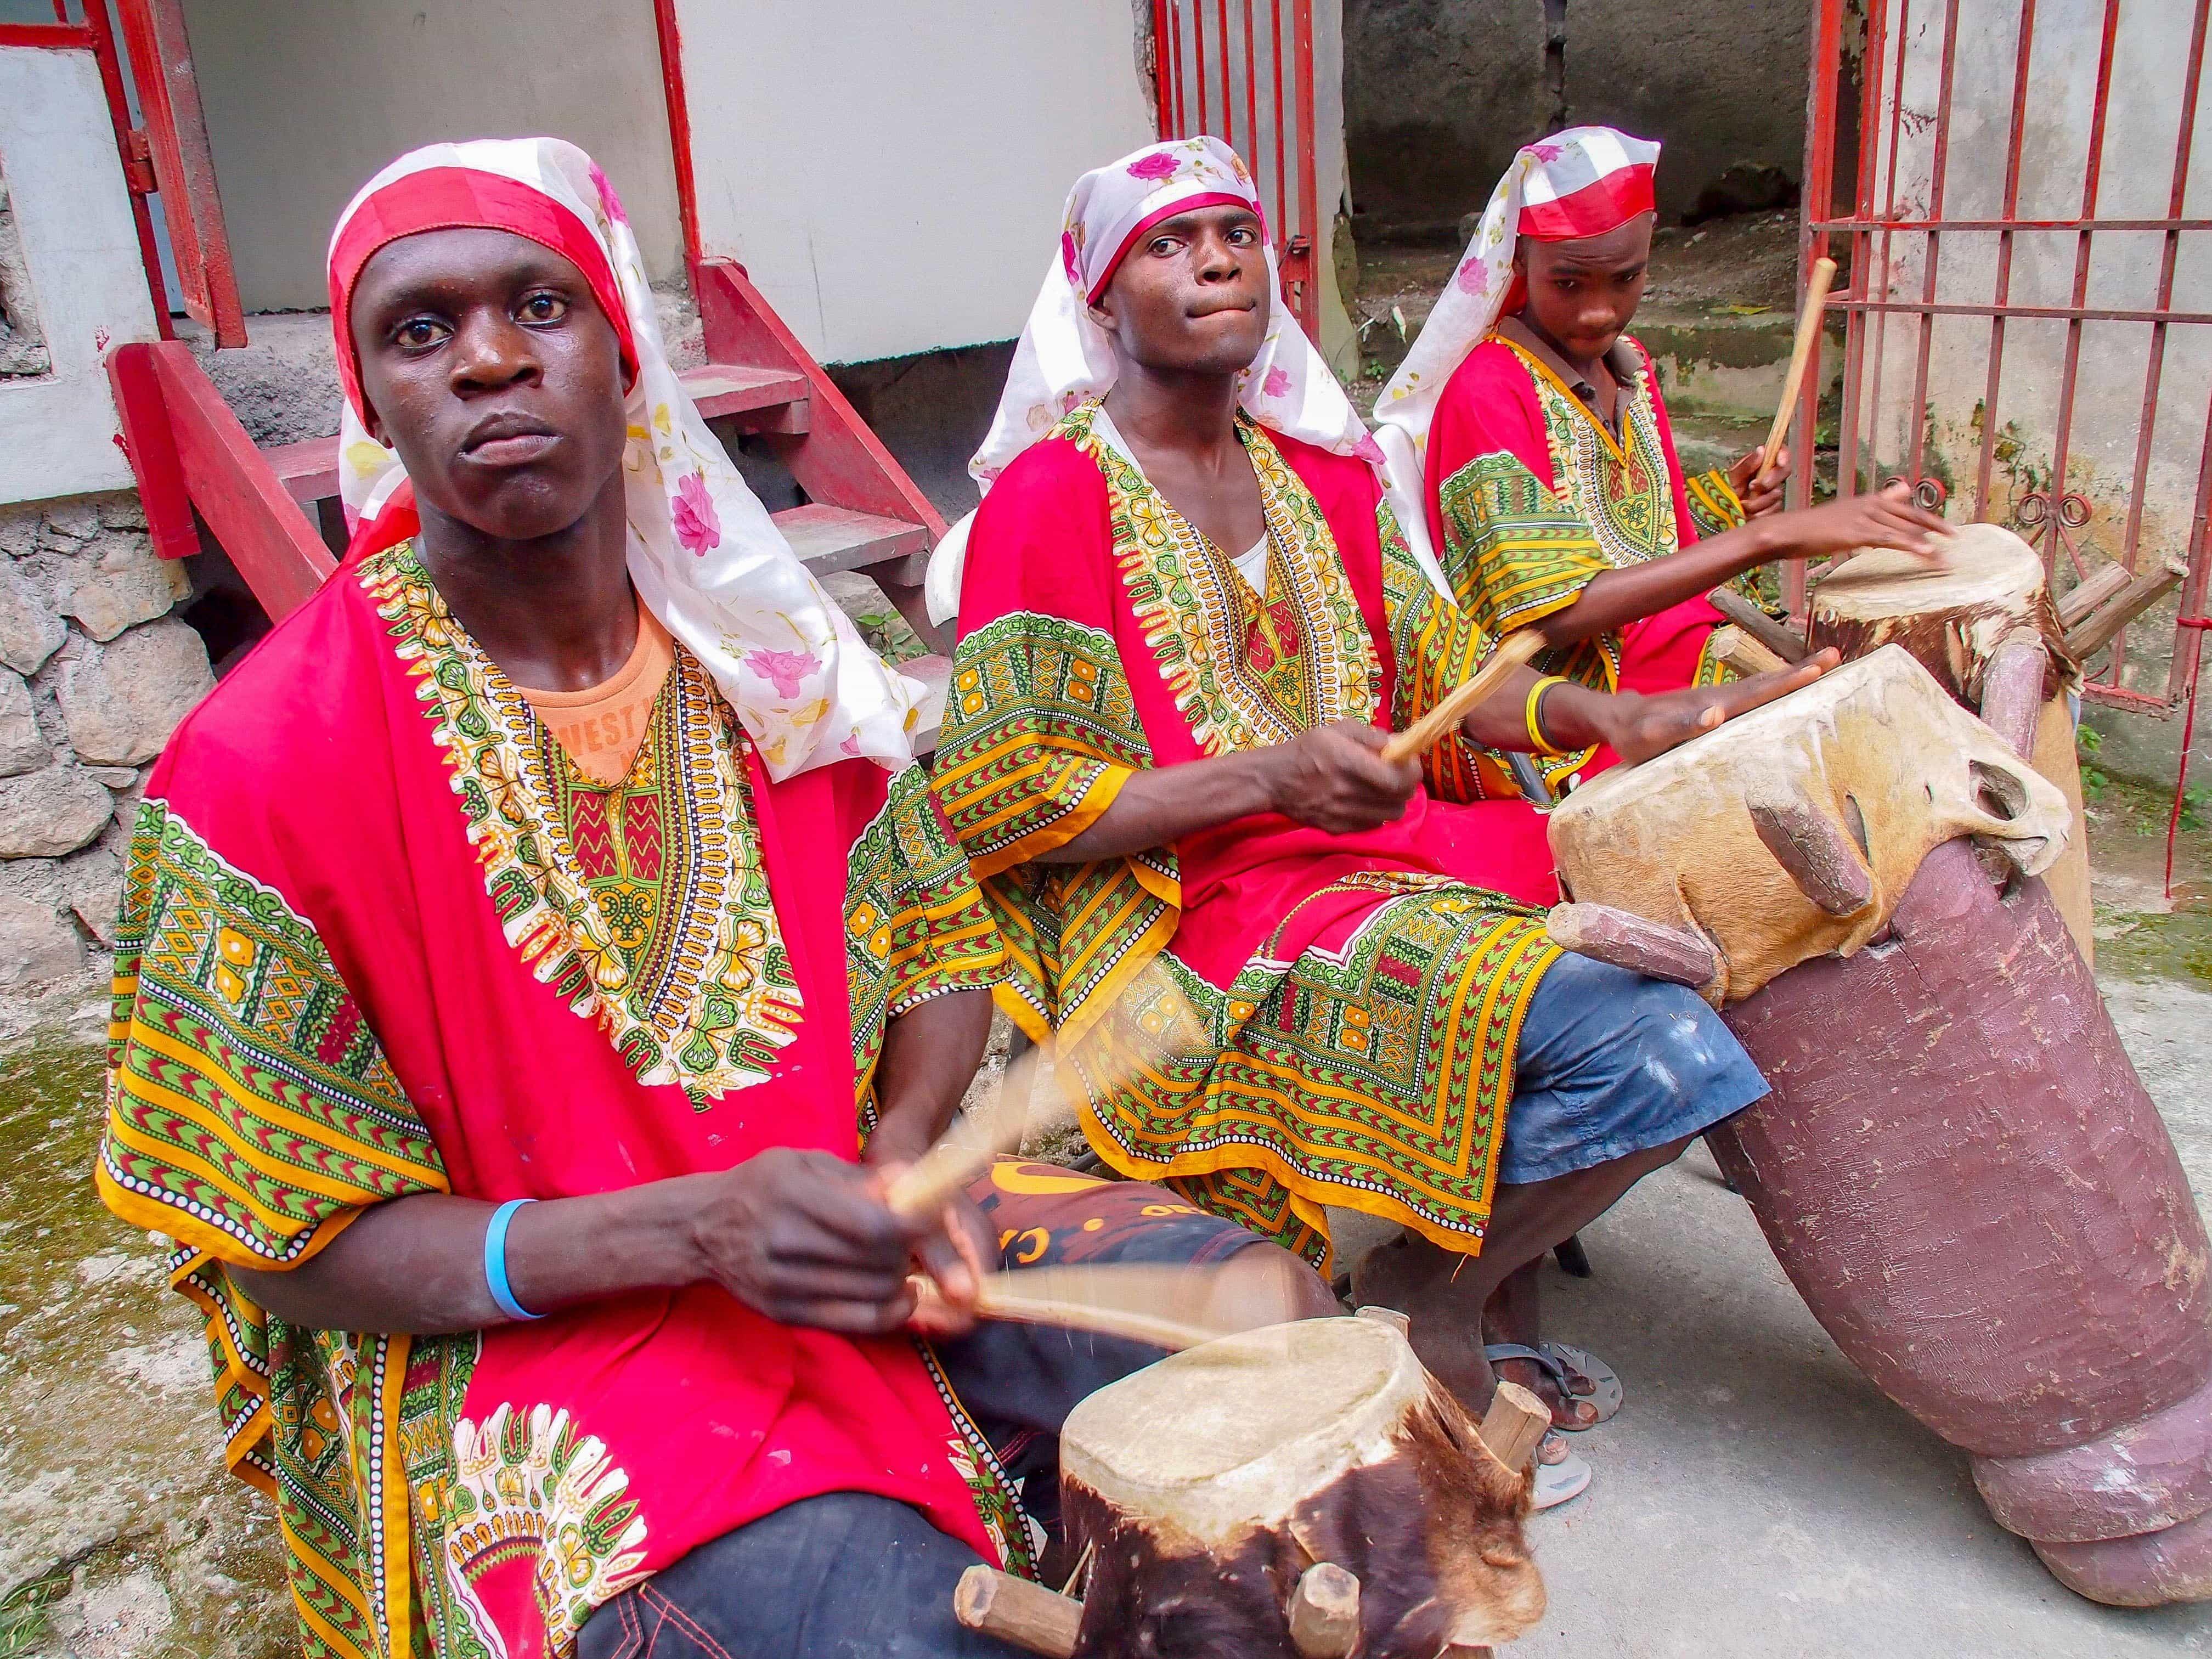 African Drumbeats in Haitian Music | Uncommon Caribbean